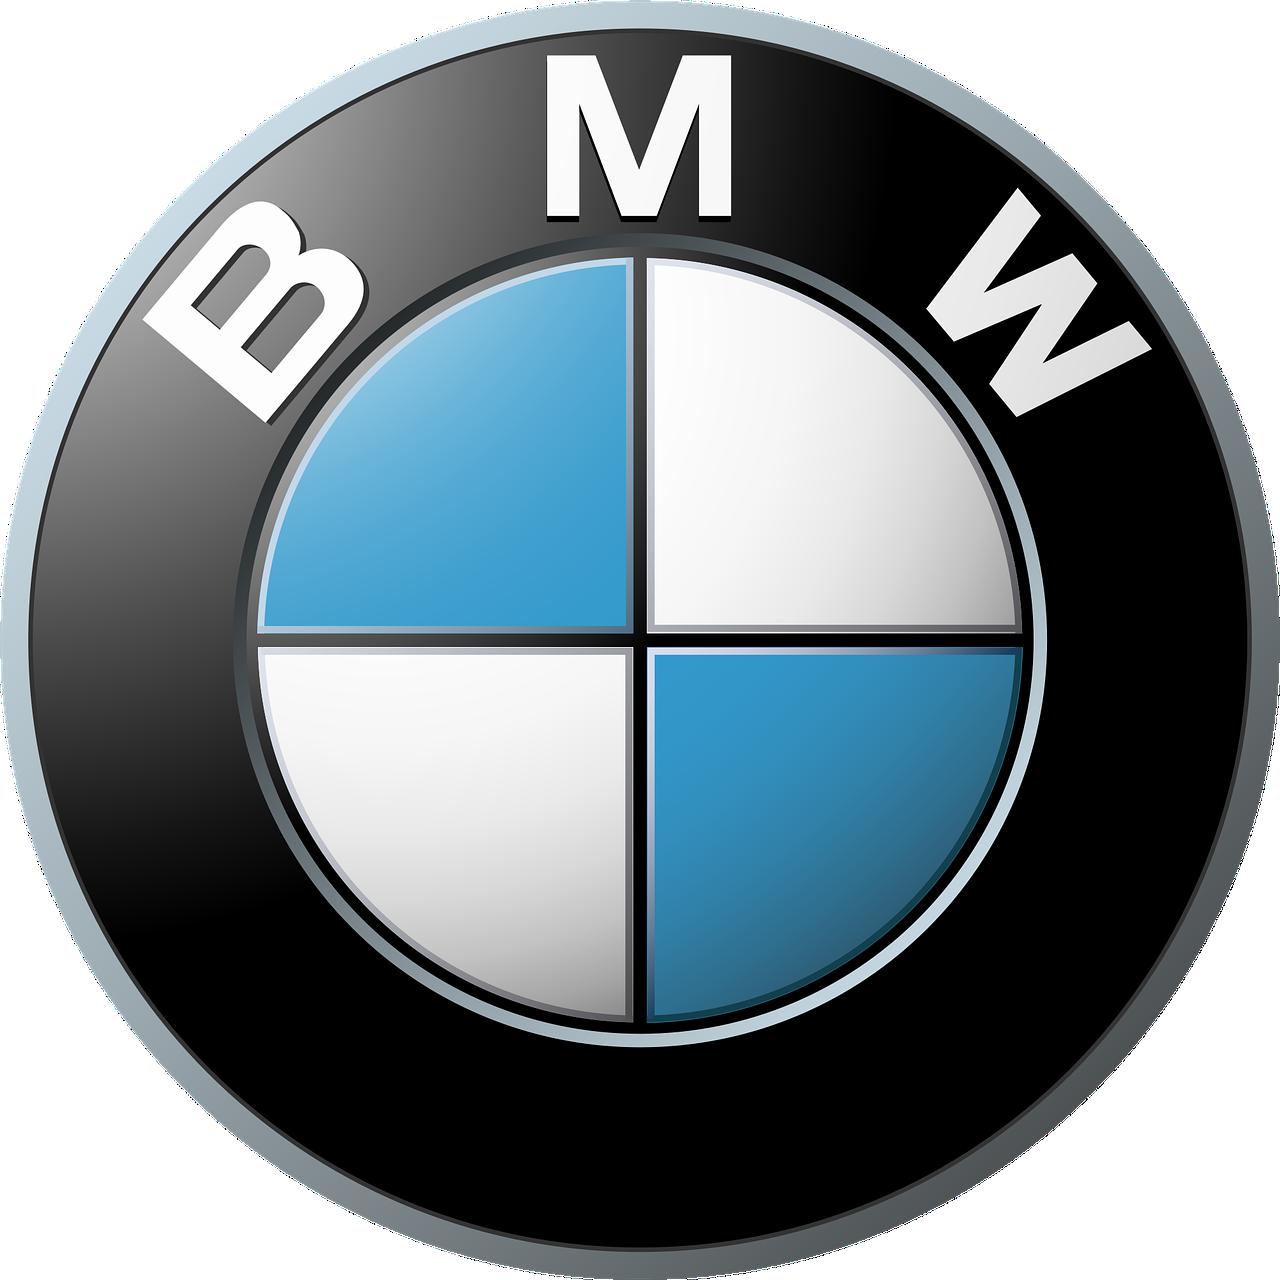 Bmw 로고 - Pixabay의 무료 이미지